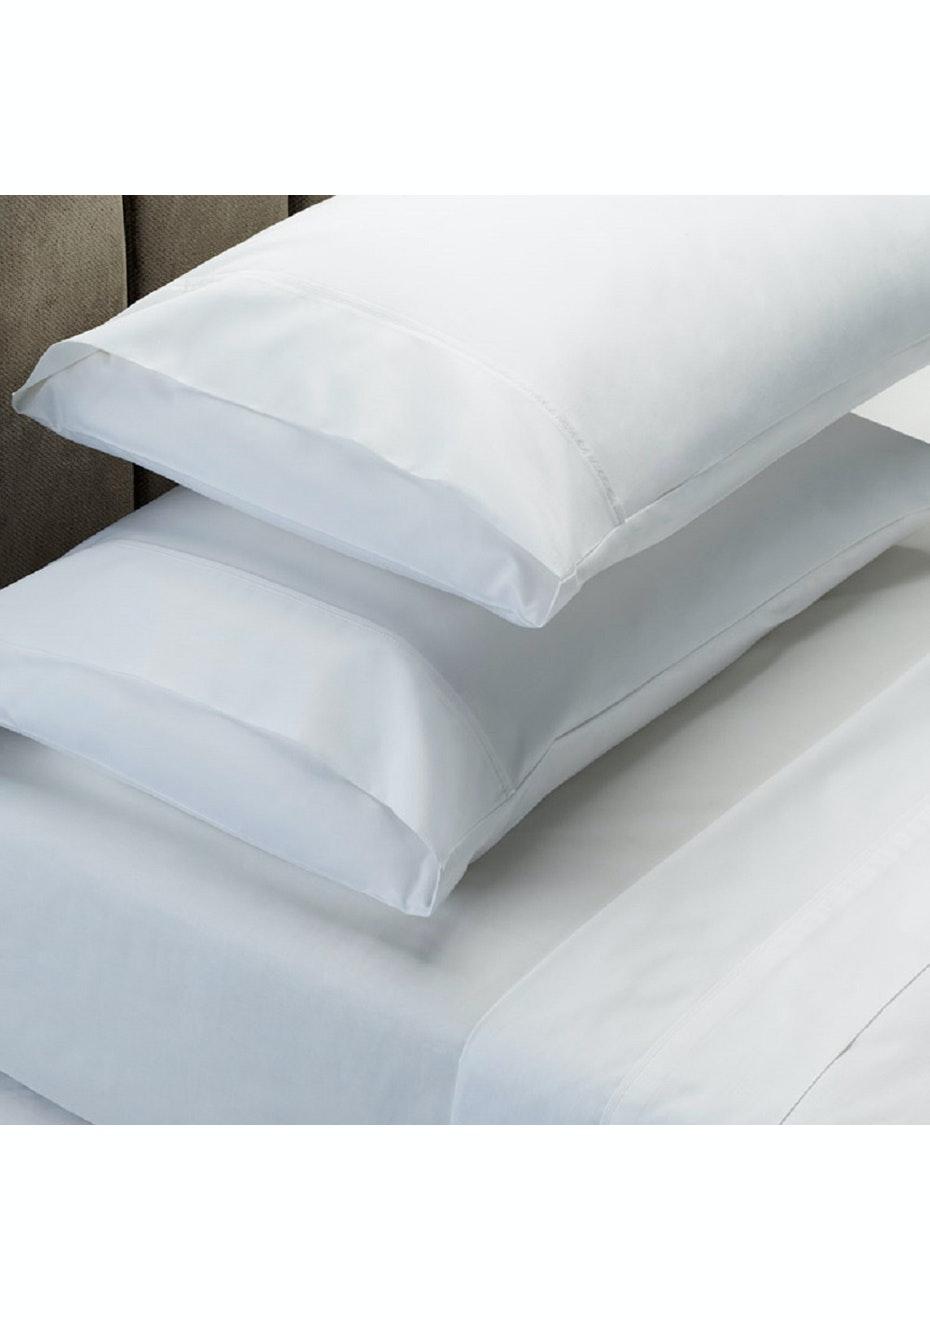 Park Avenue 1000 Thread Count 100% Egyptian Cotton Sheet Sets Mega Queen - White